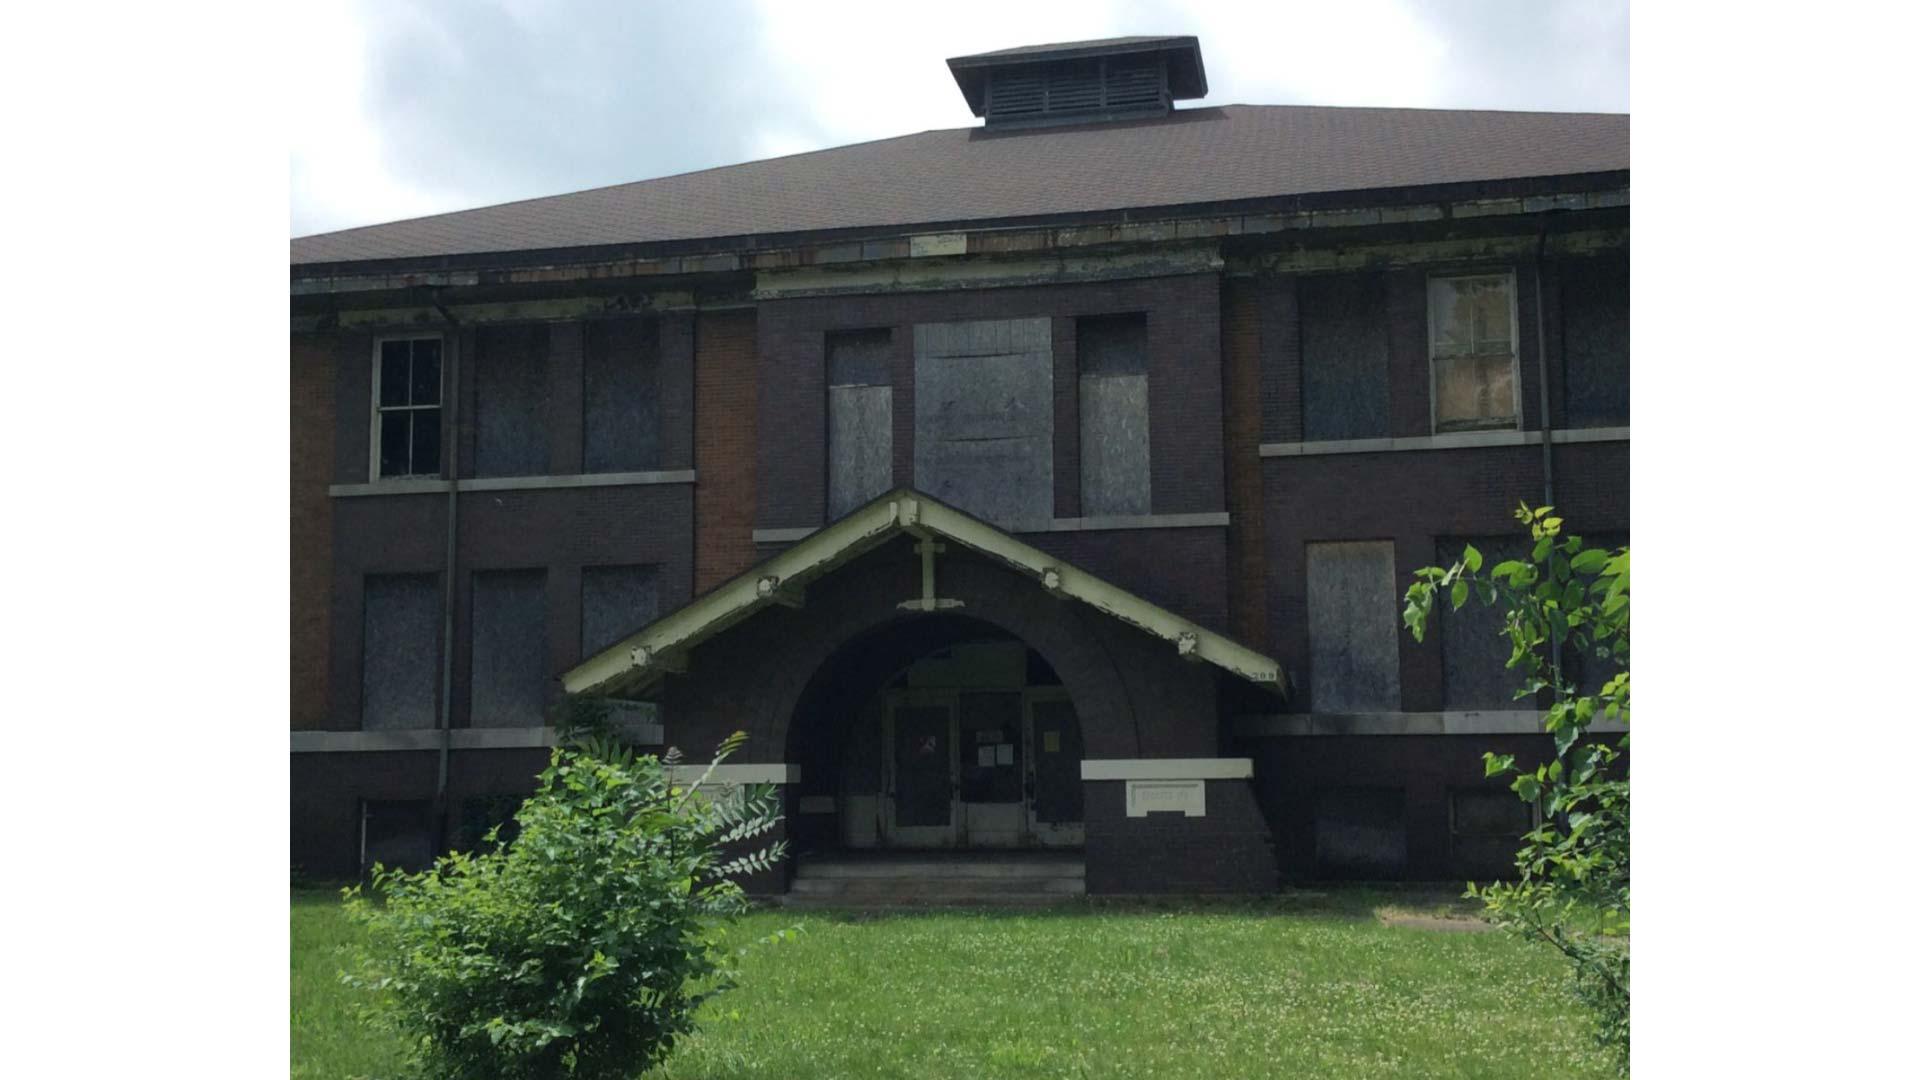 Austin School, 709 N. Clinton St., Albion